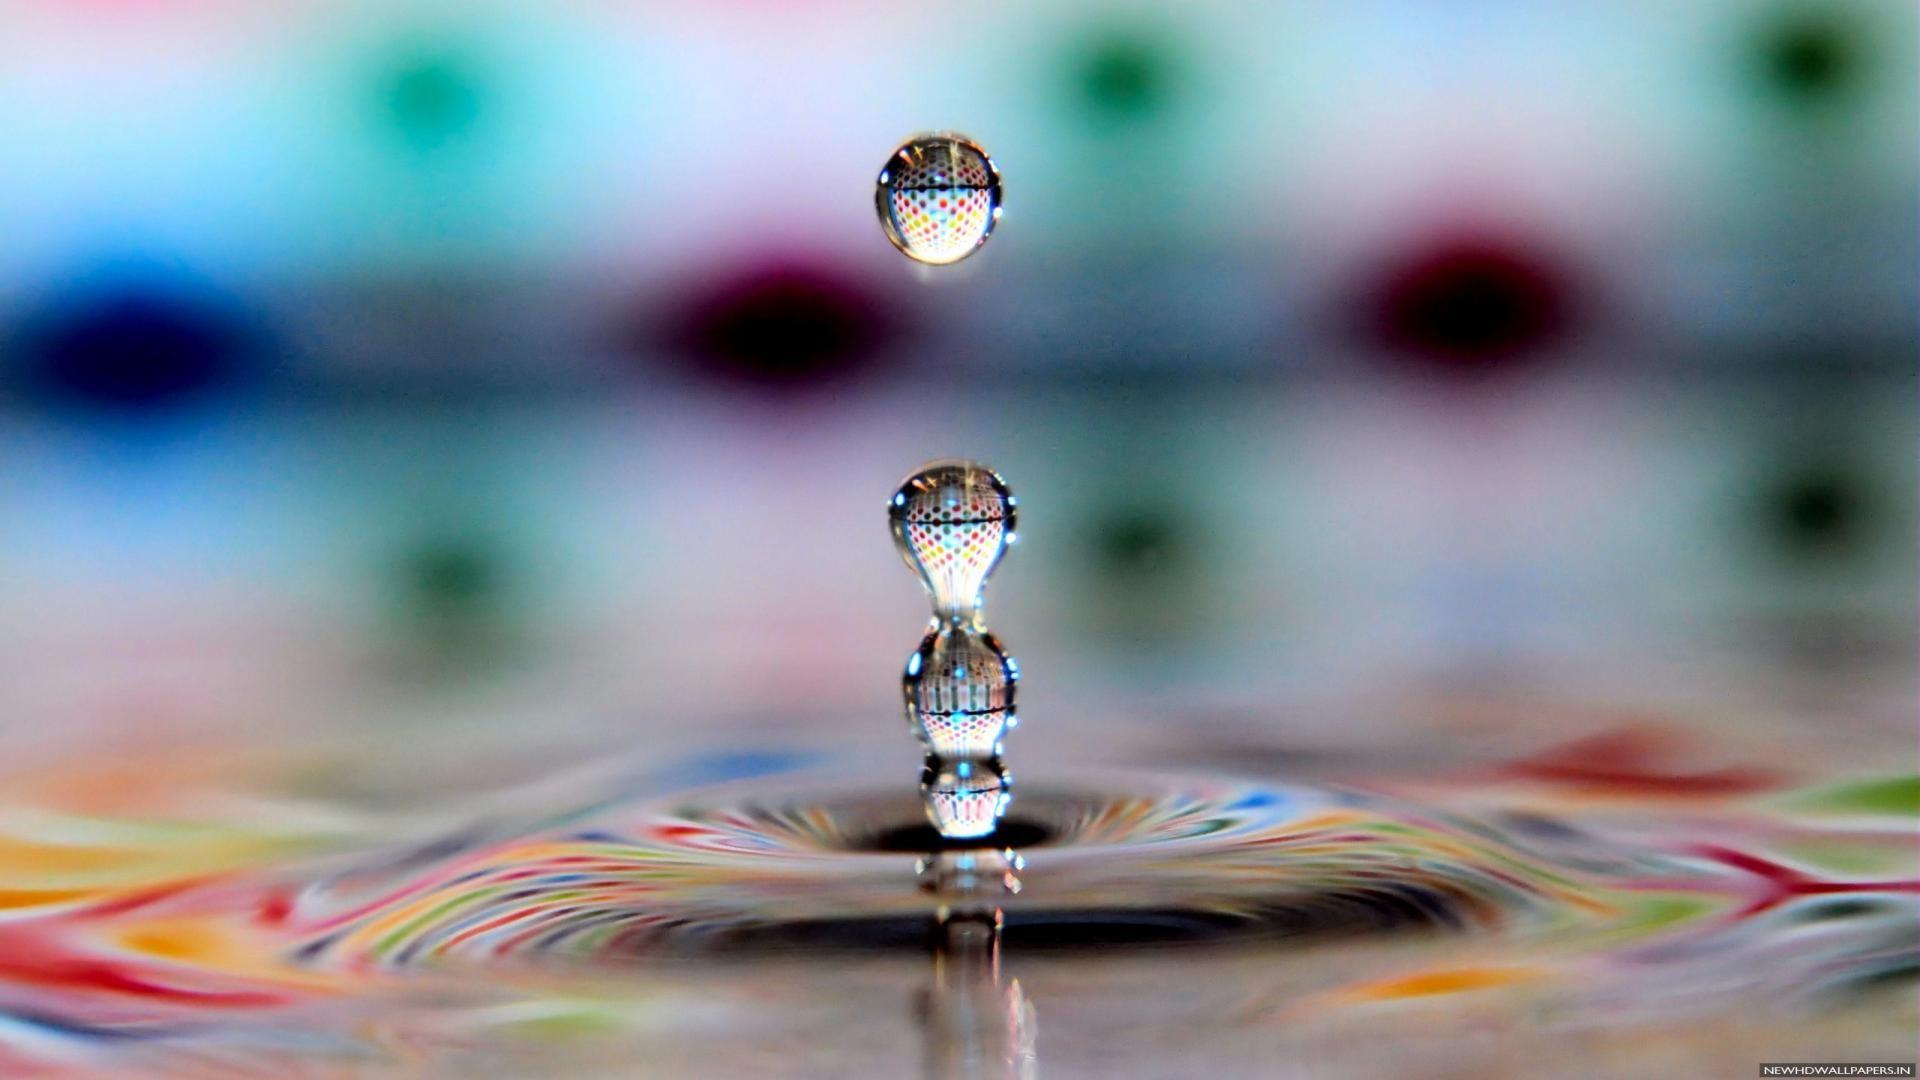 3d Water Drop Photography Wallpaper Hd Desktop Desktop Wallpaper